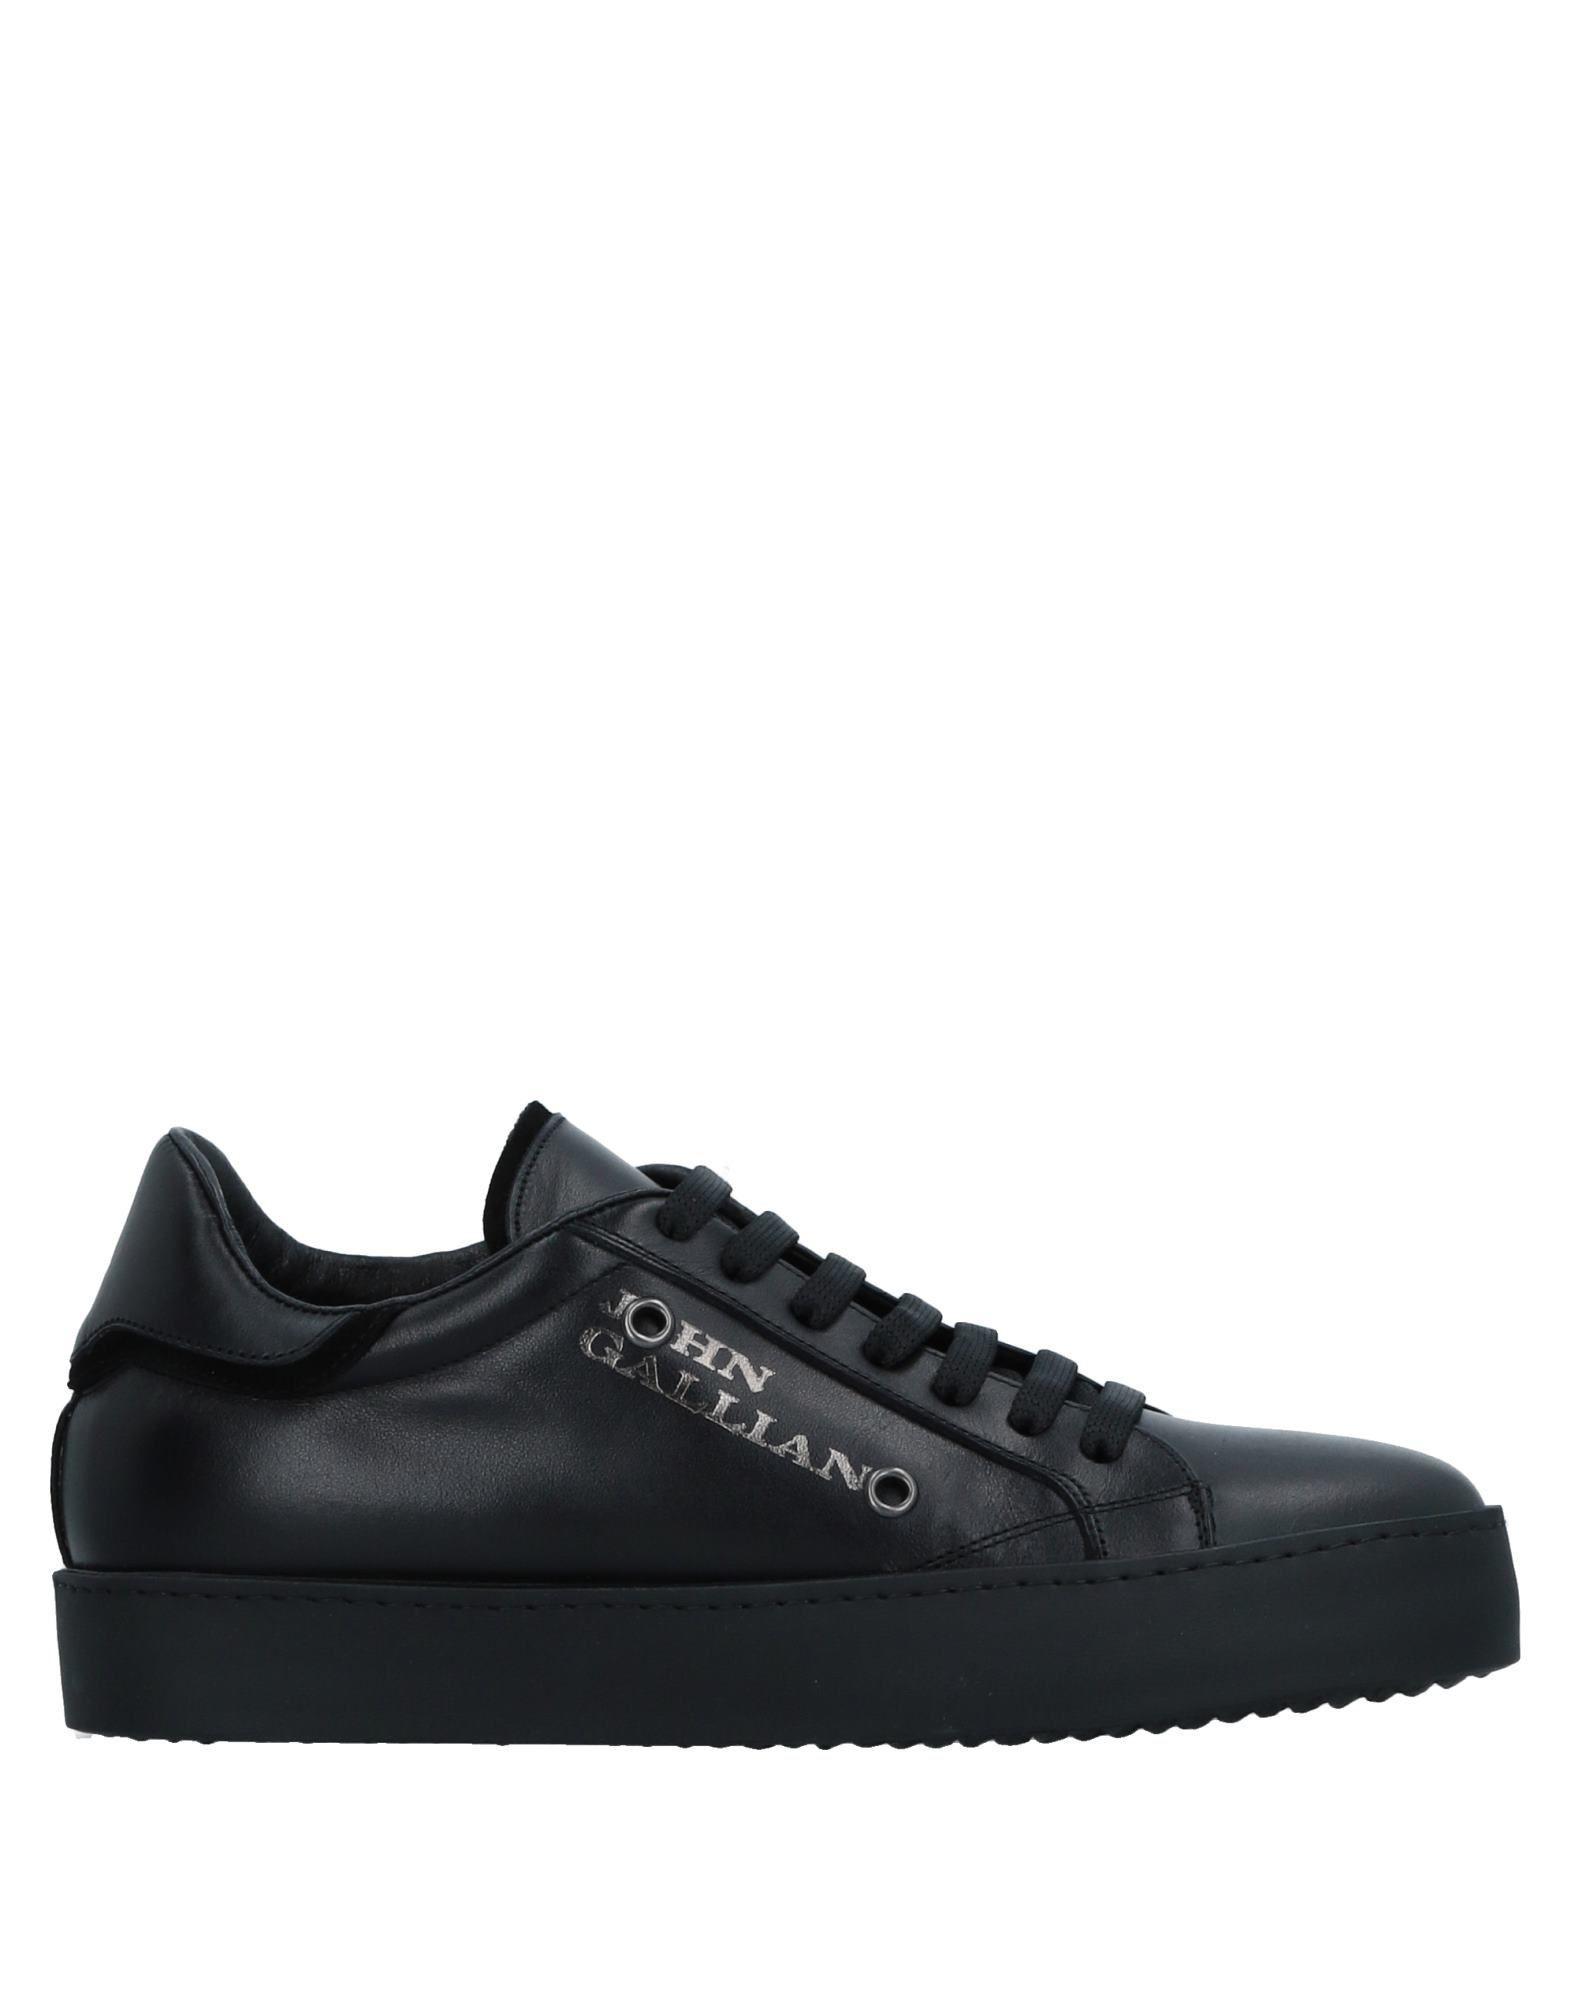 John Galliano Sneakers In Black